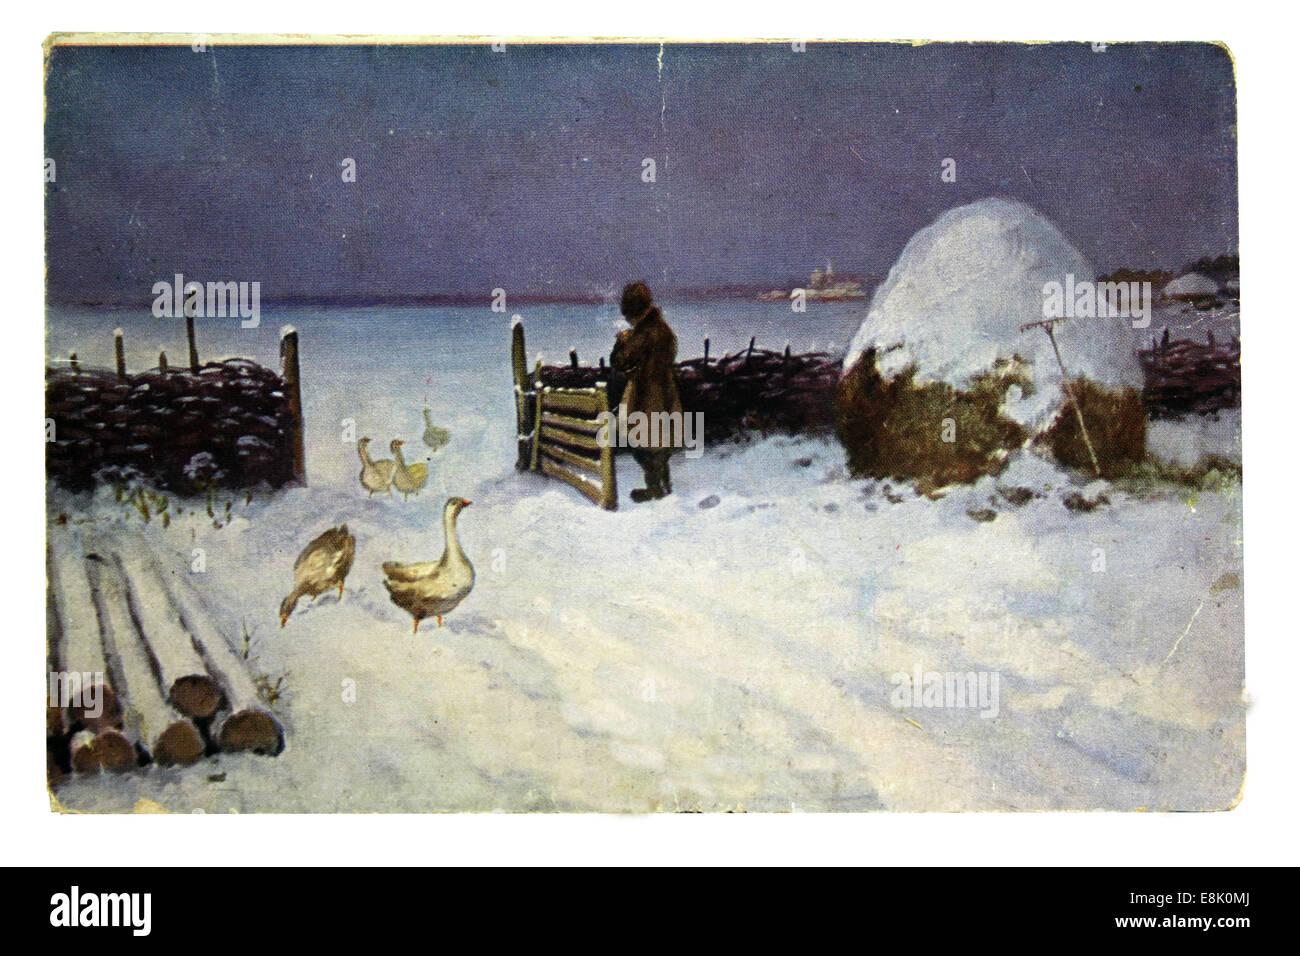 Postcard printed in Russia shows M. Garmashev. 1st Dec, 2009. Snow fell, circa 1909 © Igor Golovniov/ZUMA Wire/ZUMAPRESS.com/Alamy - Stock Image